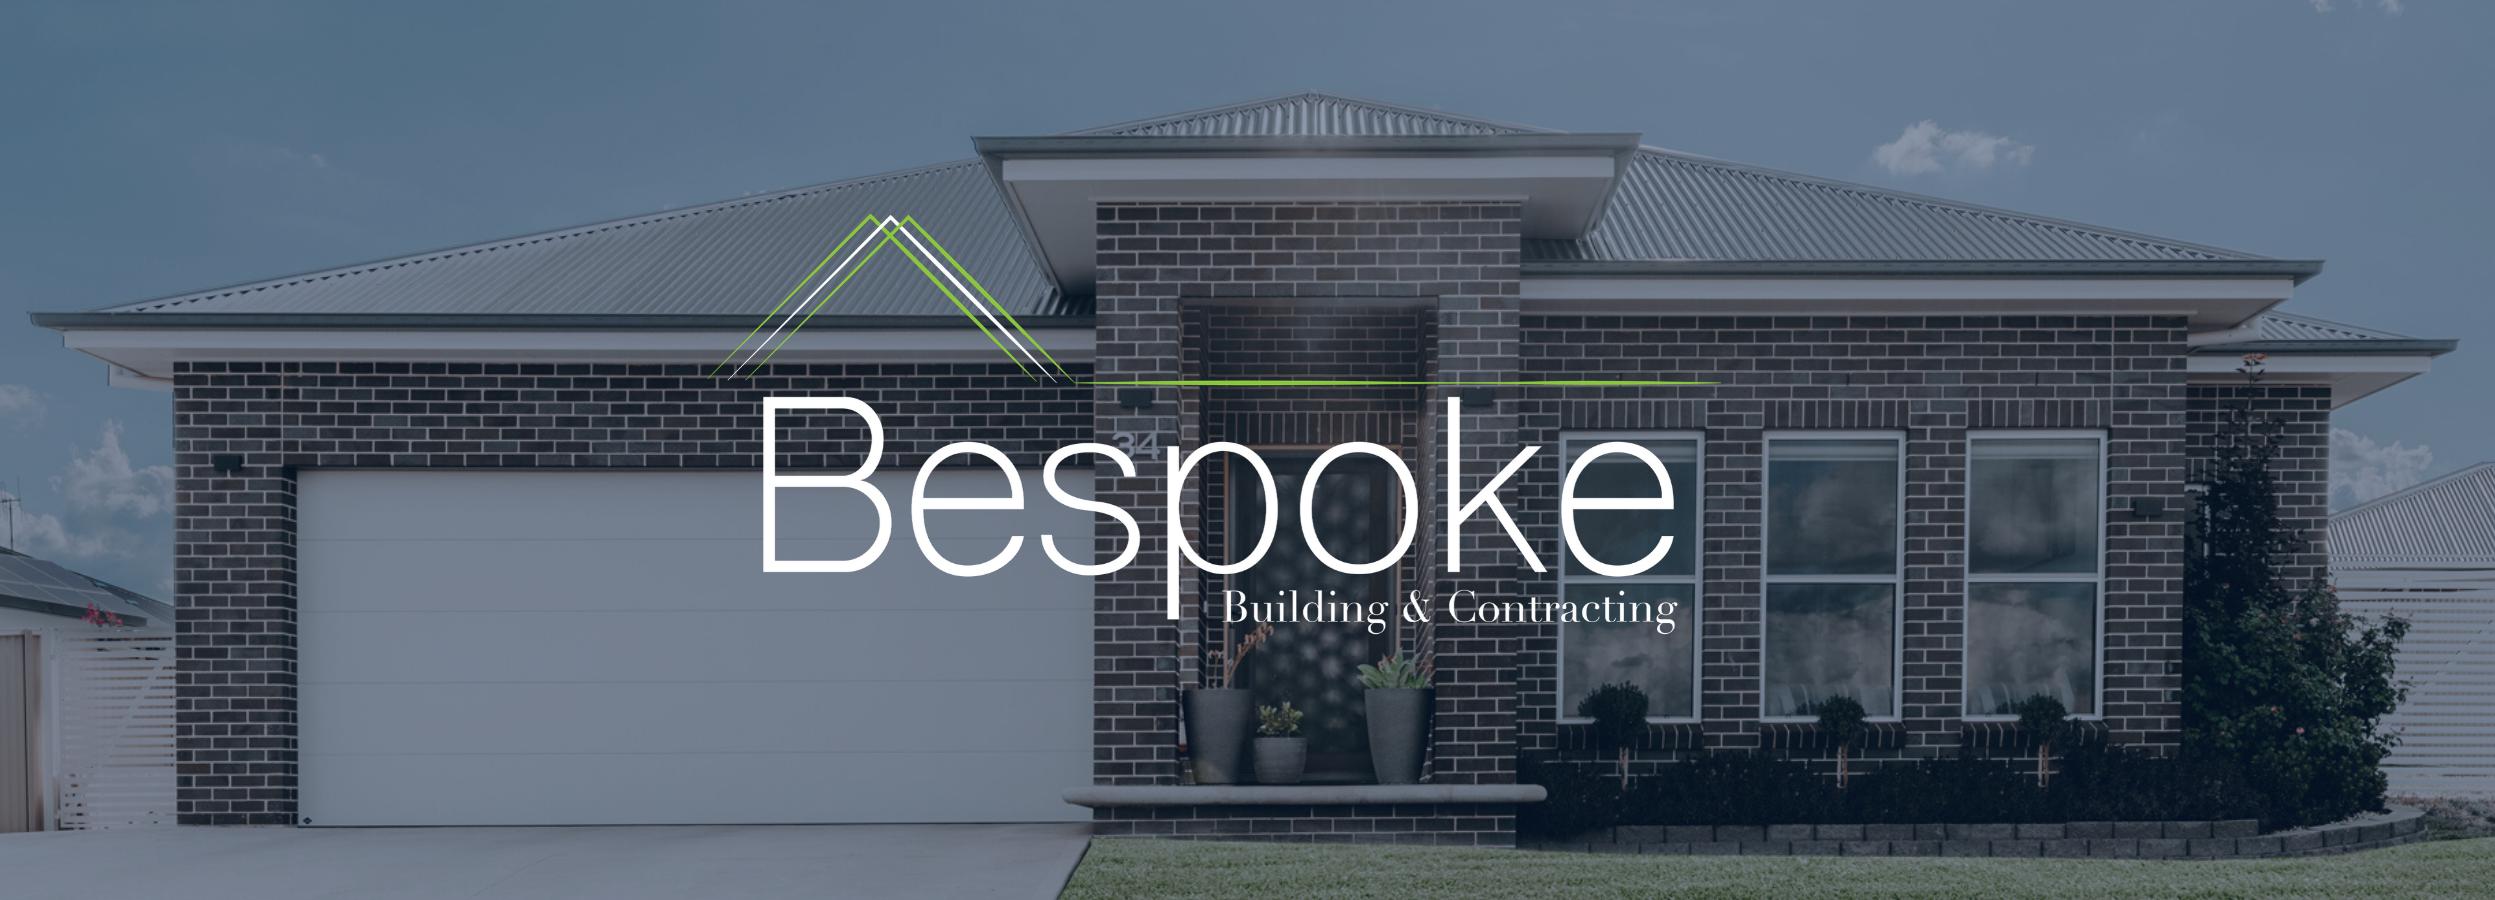 Bespoke Building & Contracting